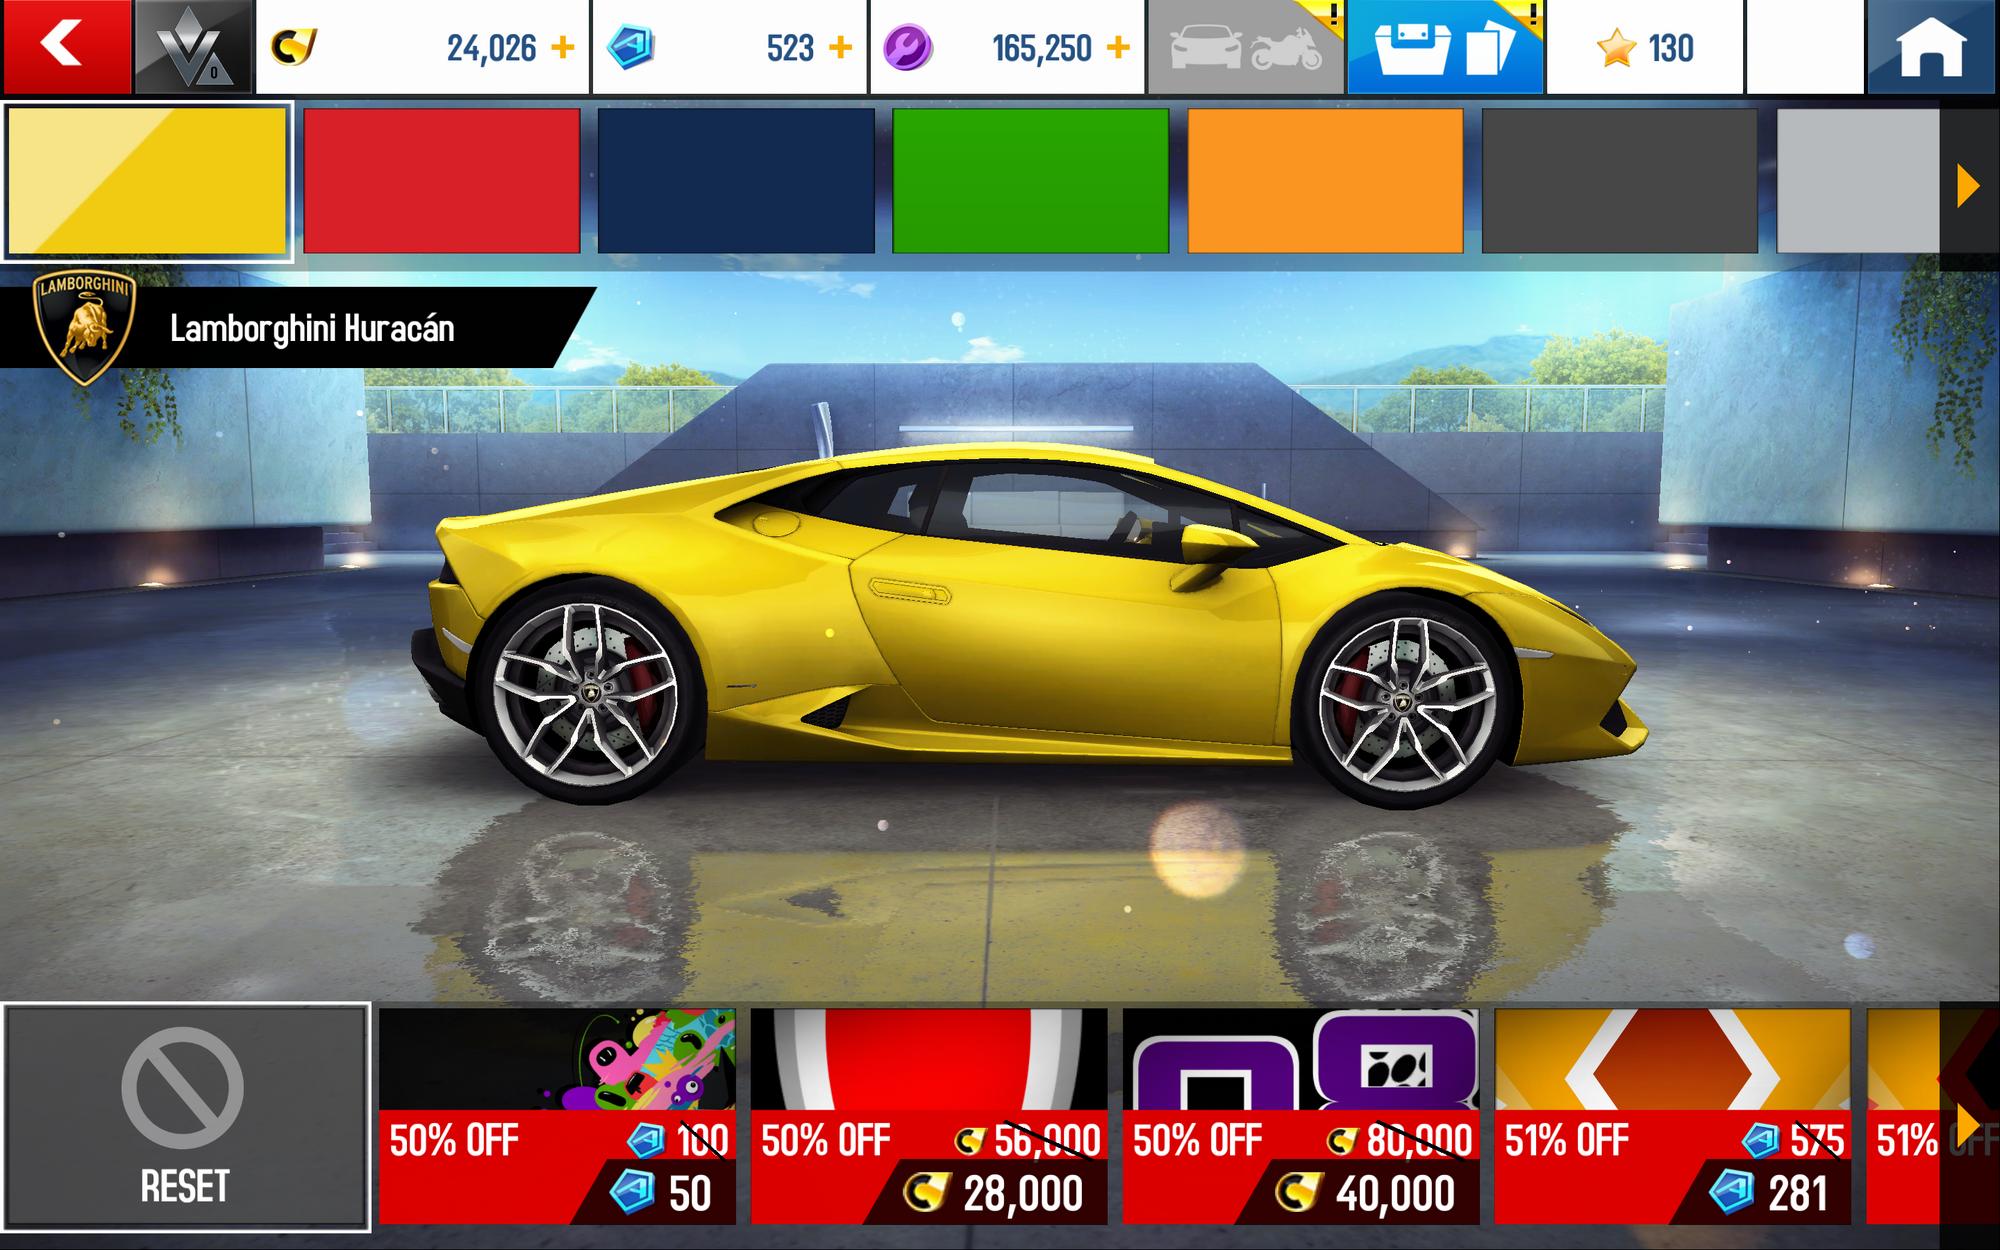 2000?cb=20161111071616 Modern Lamborghini Huracán Spyder Lp 610-4 Cars Trend